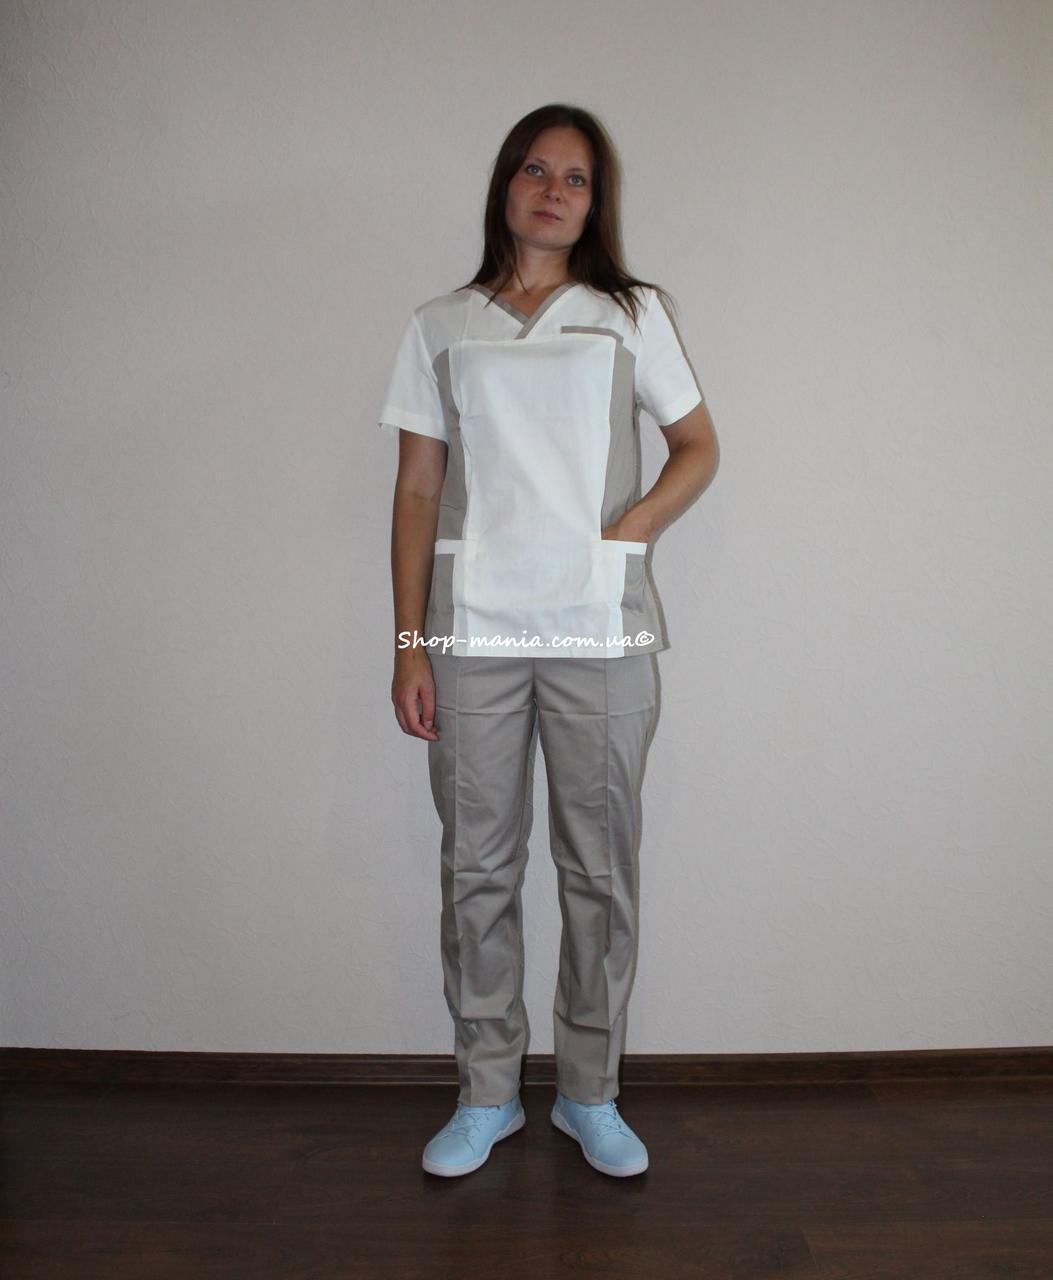 Хирургический медицинский женский костюм SM 1400-12 коттон Lilija 42-56 р (молочный-беж)